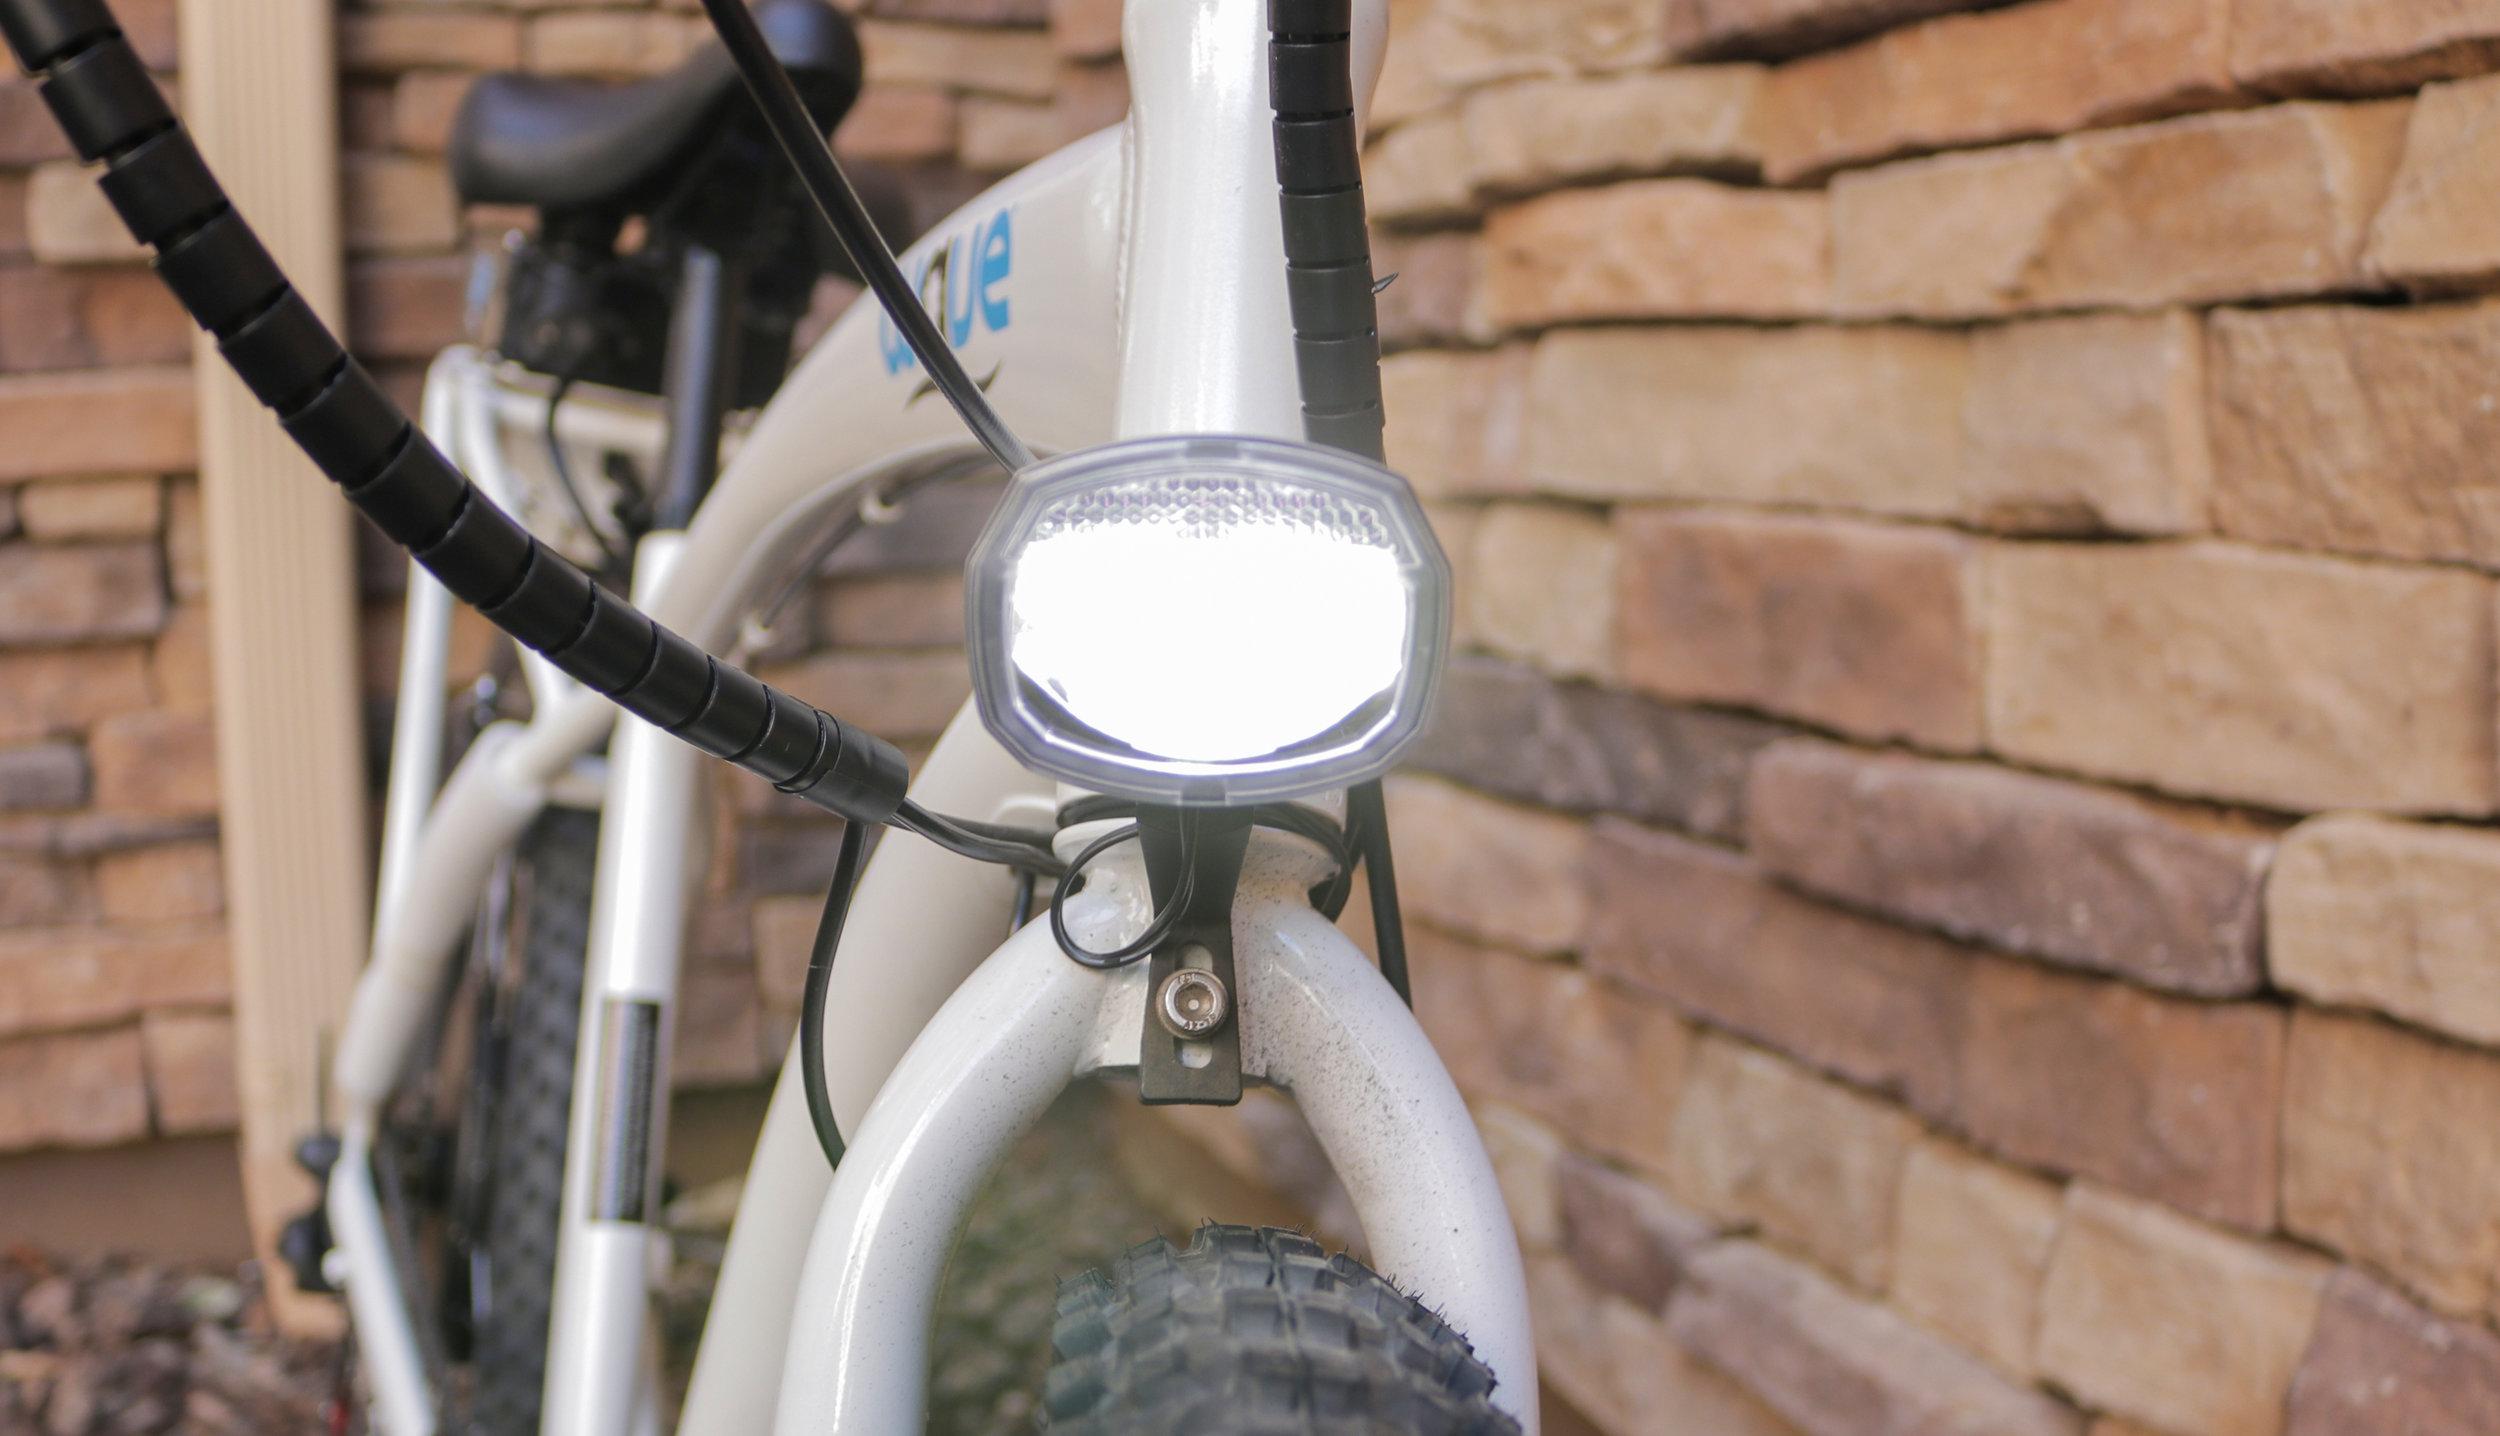 electrified-reviews-wave-electric-bike-review-headlight.jpg